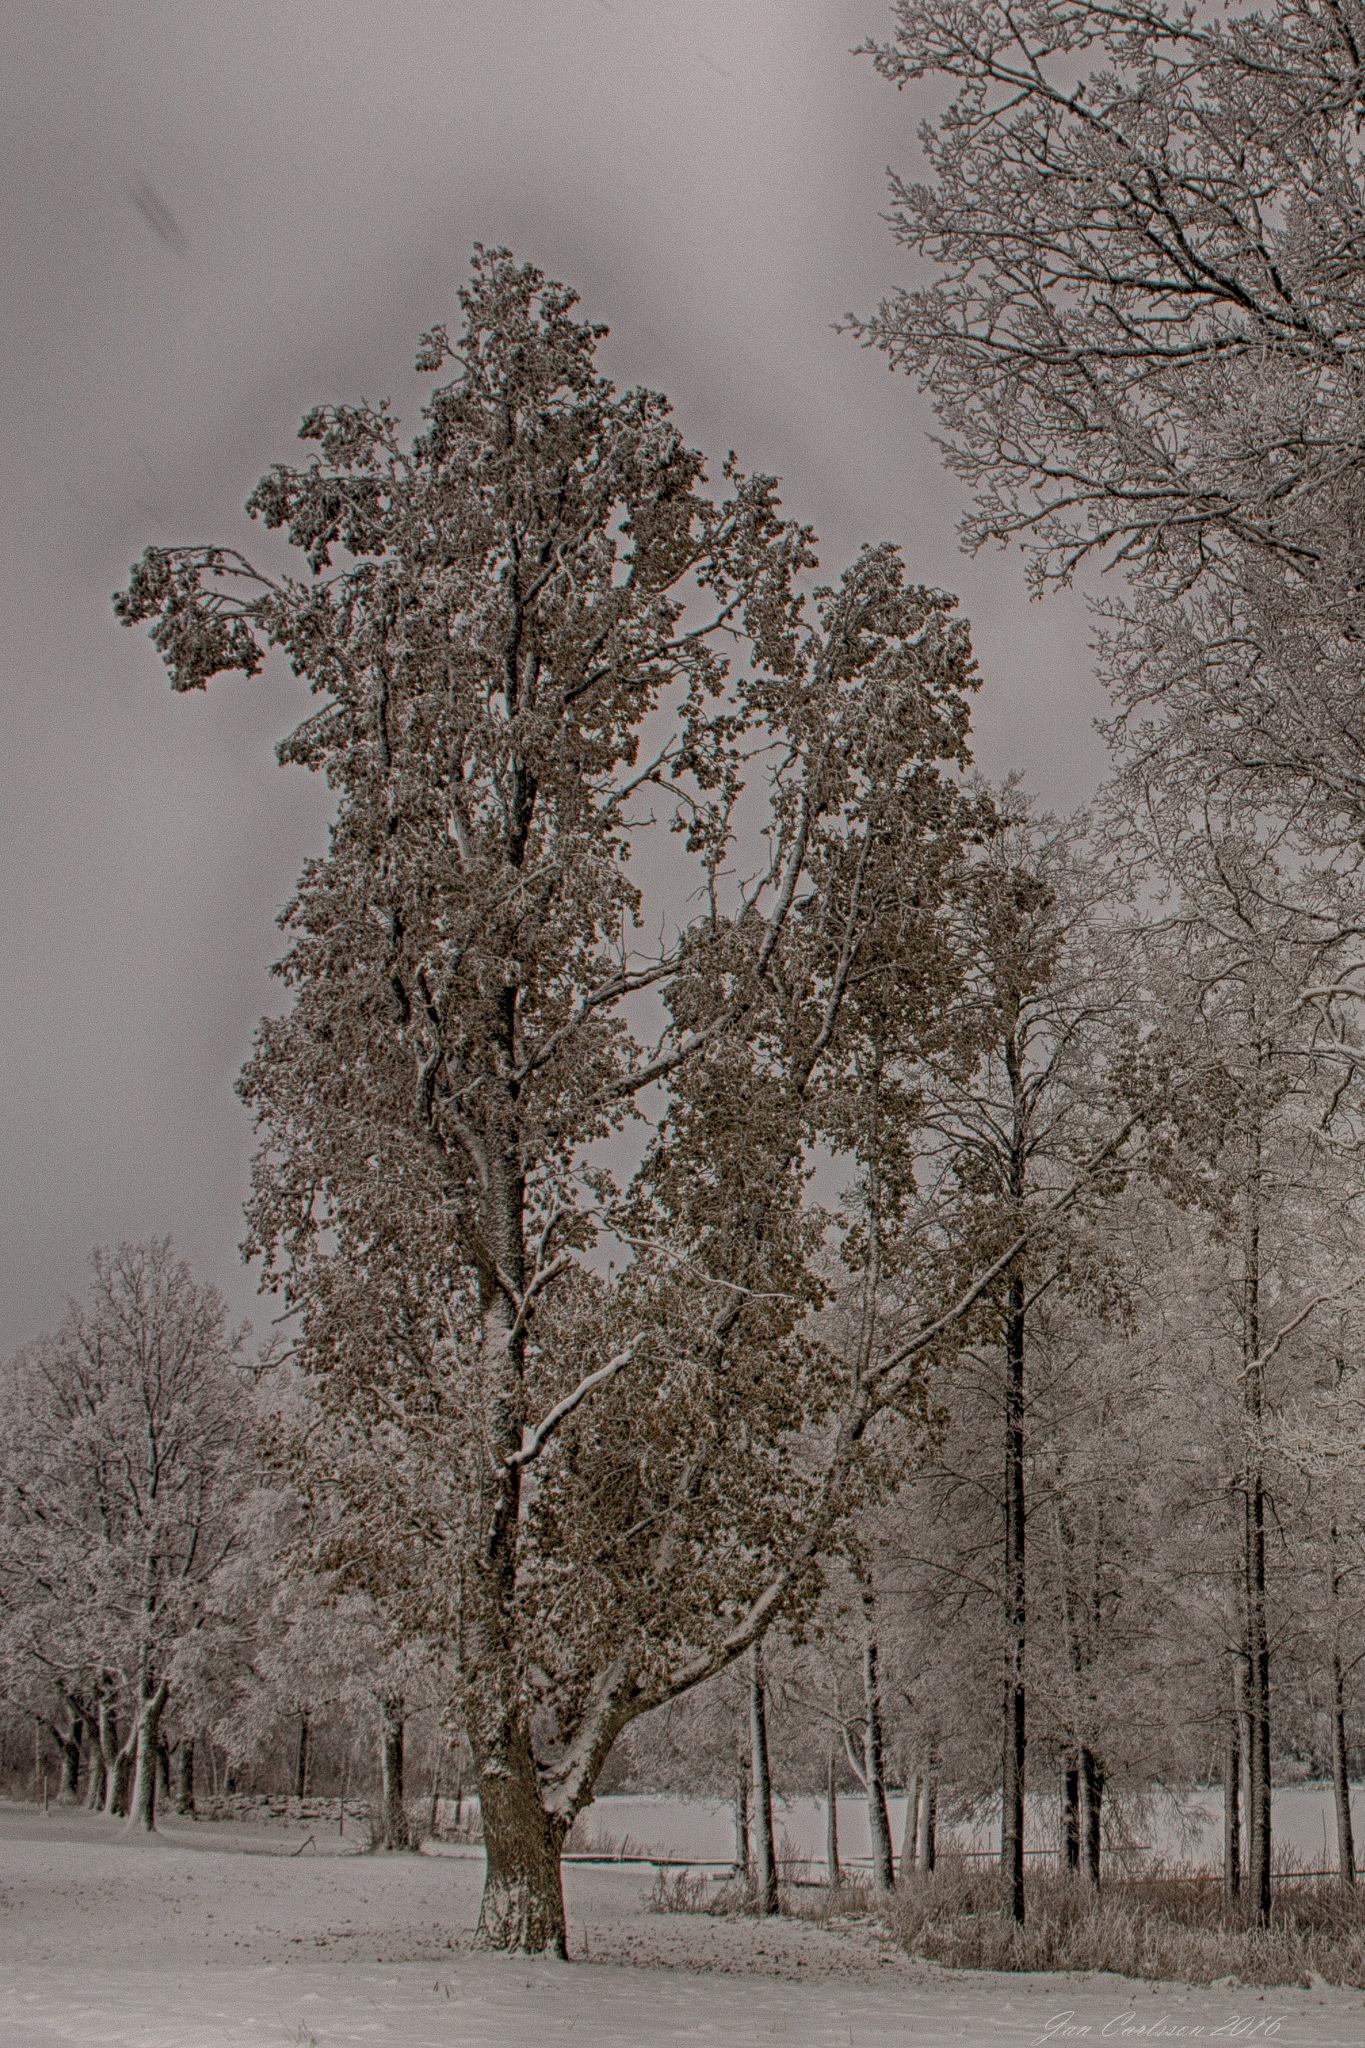 Winter Morning Trees by carljan w carlsson